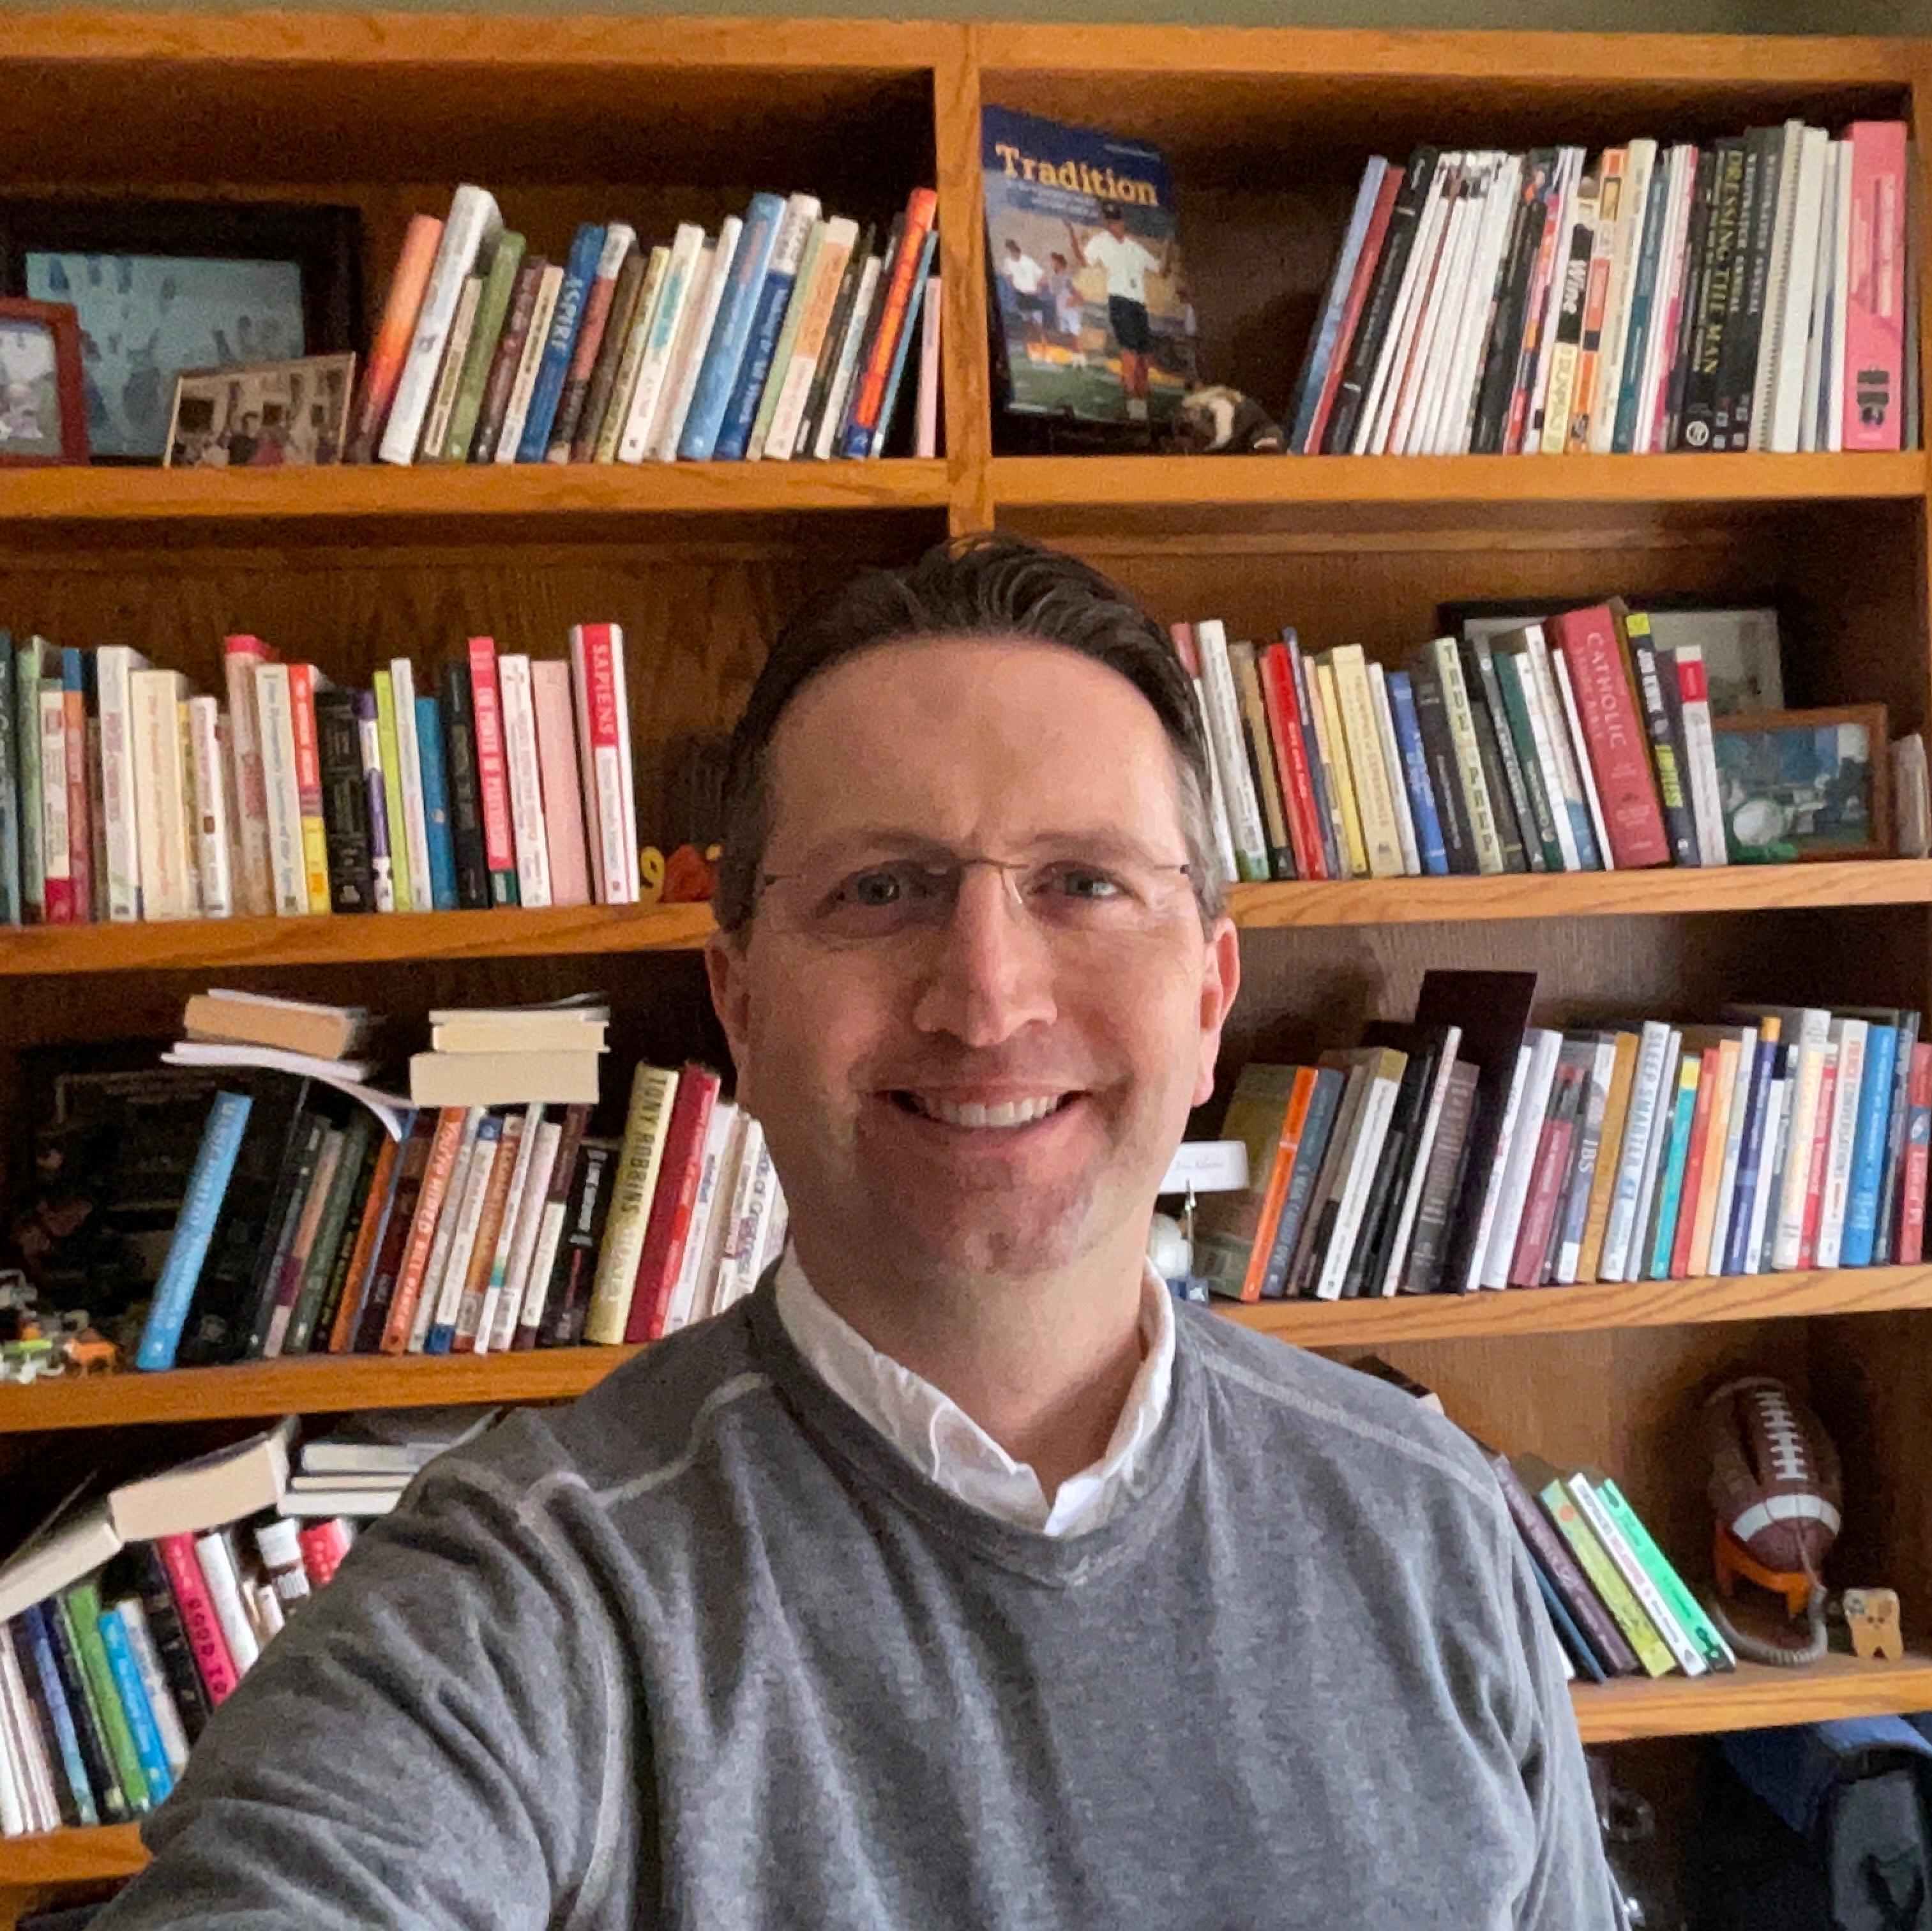 Dr. John Klooster